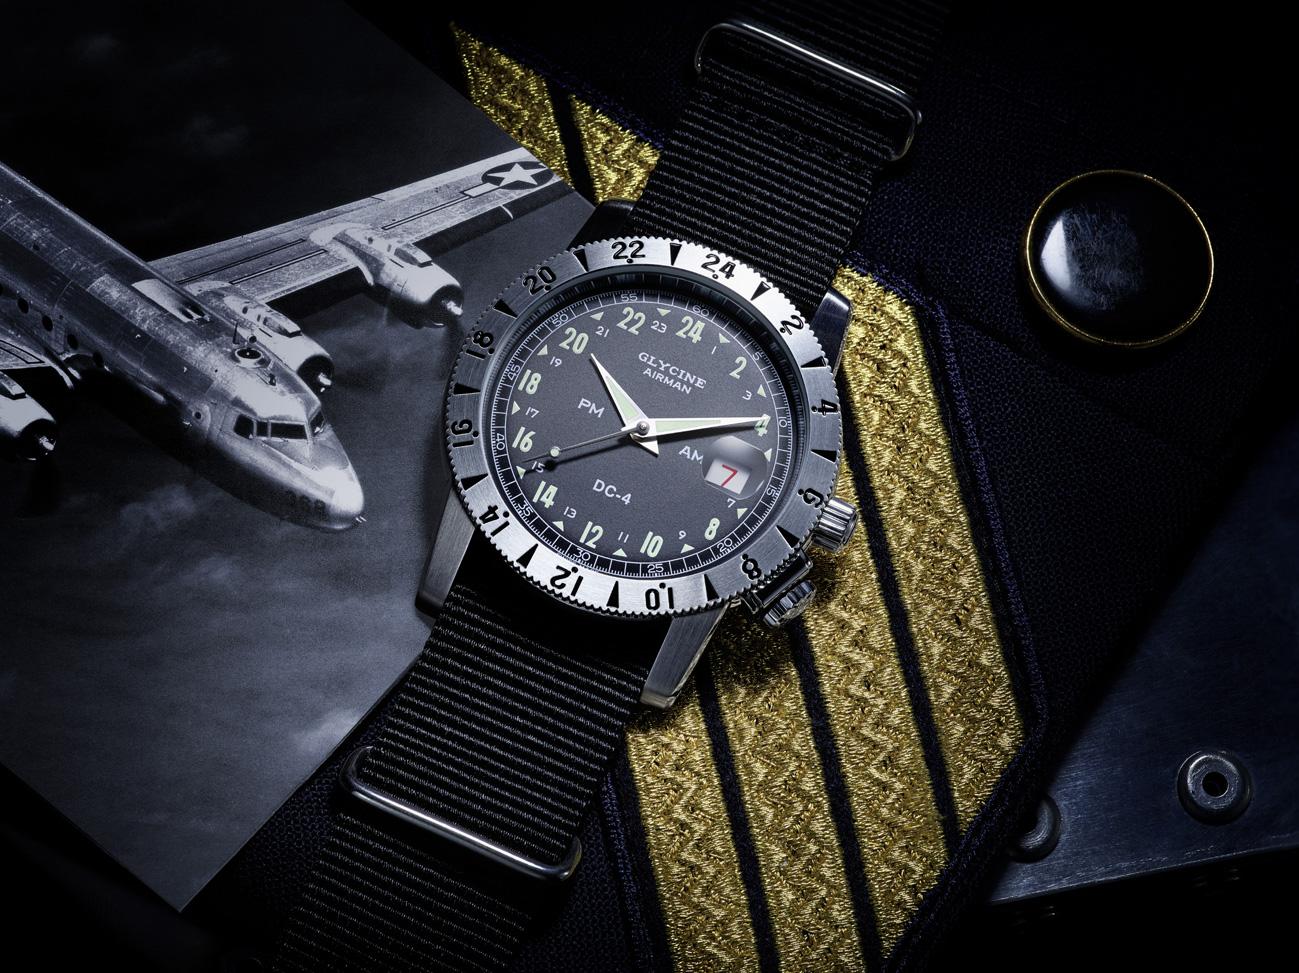 Glycine presenta el reloj Airman DC-4